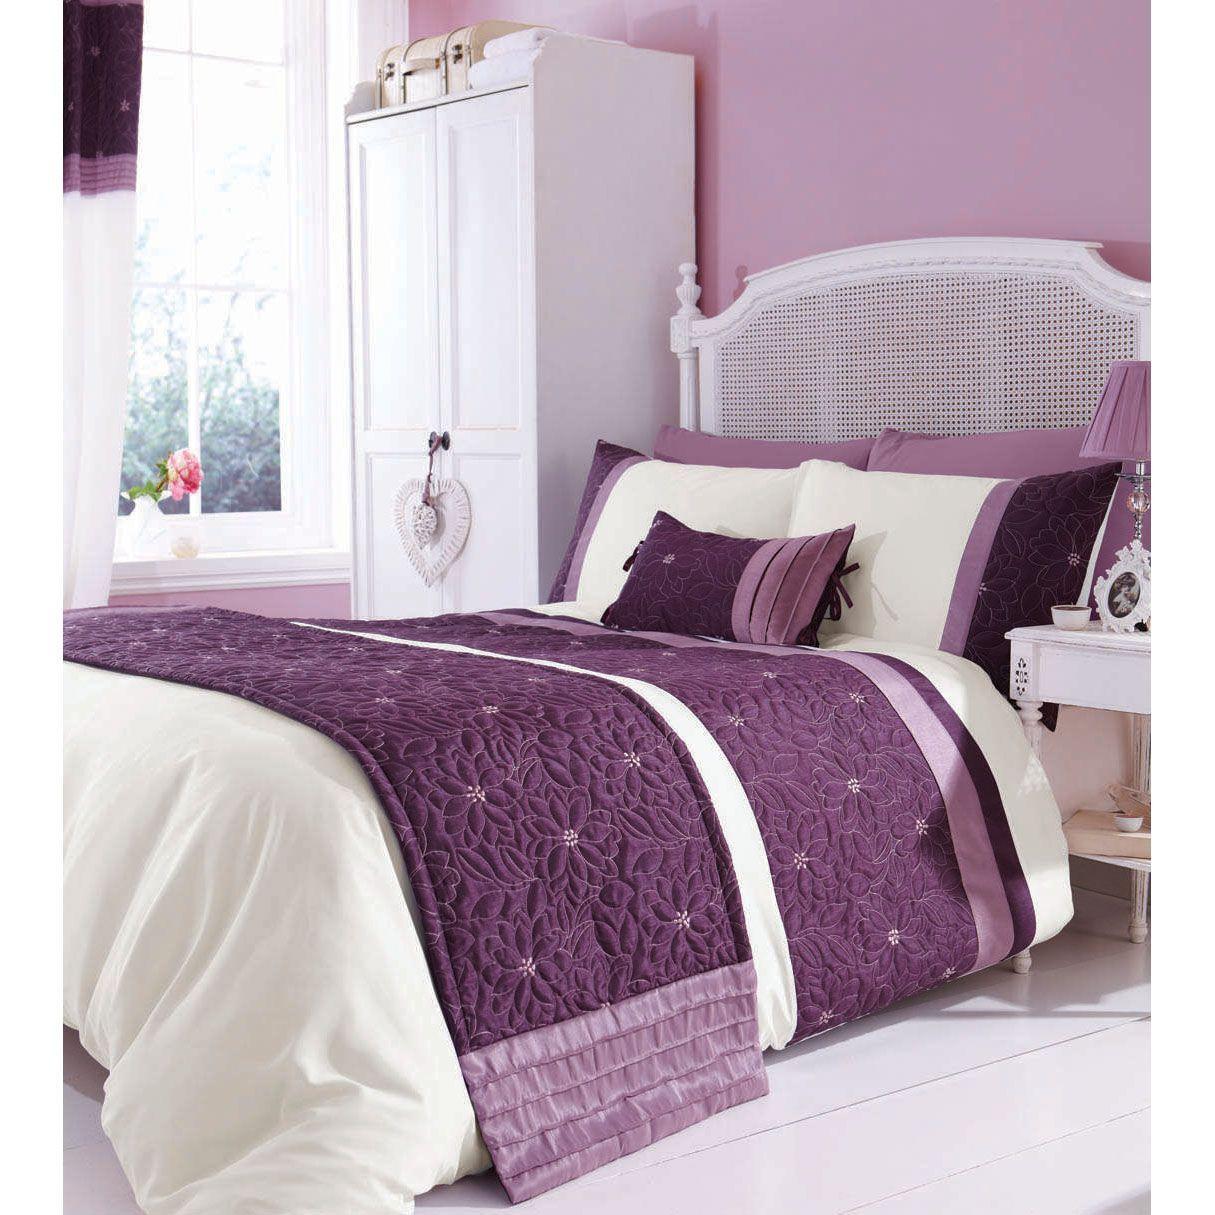 Mauve Bedding Sets Mauve bedding, Duvet cover master